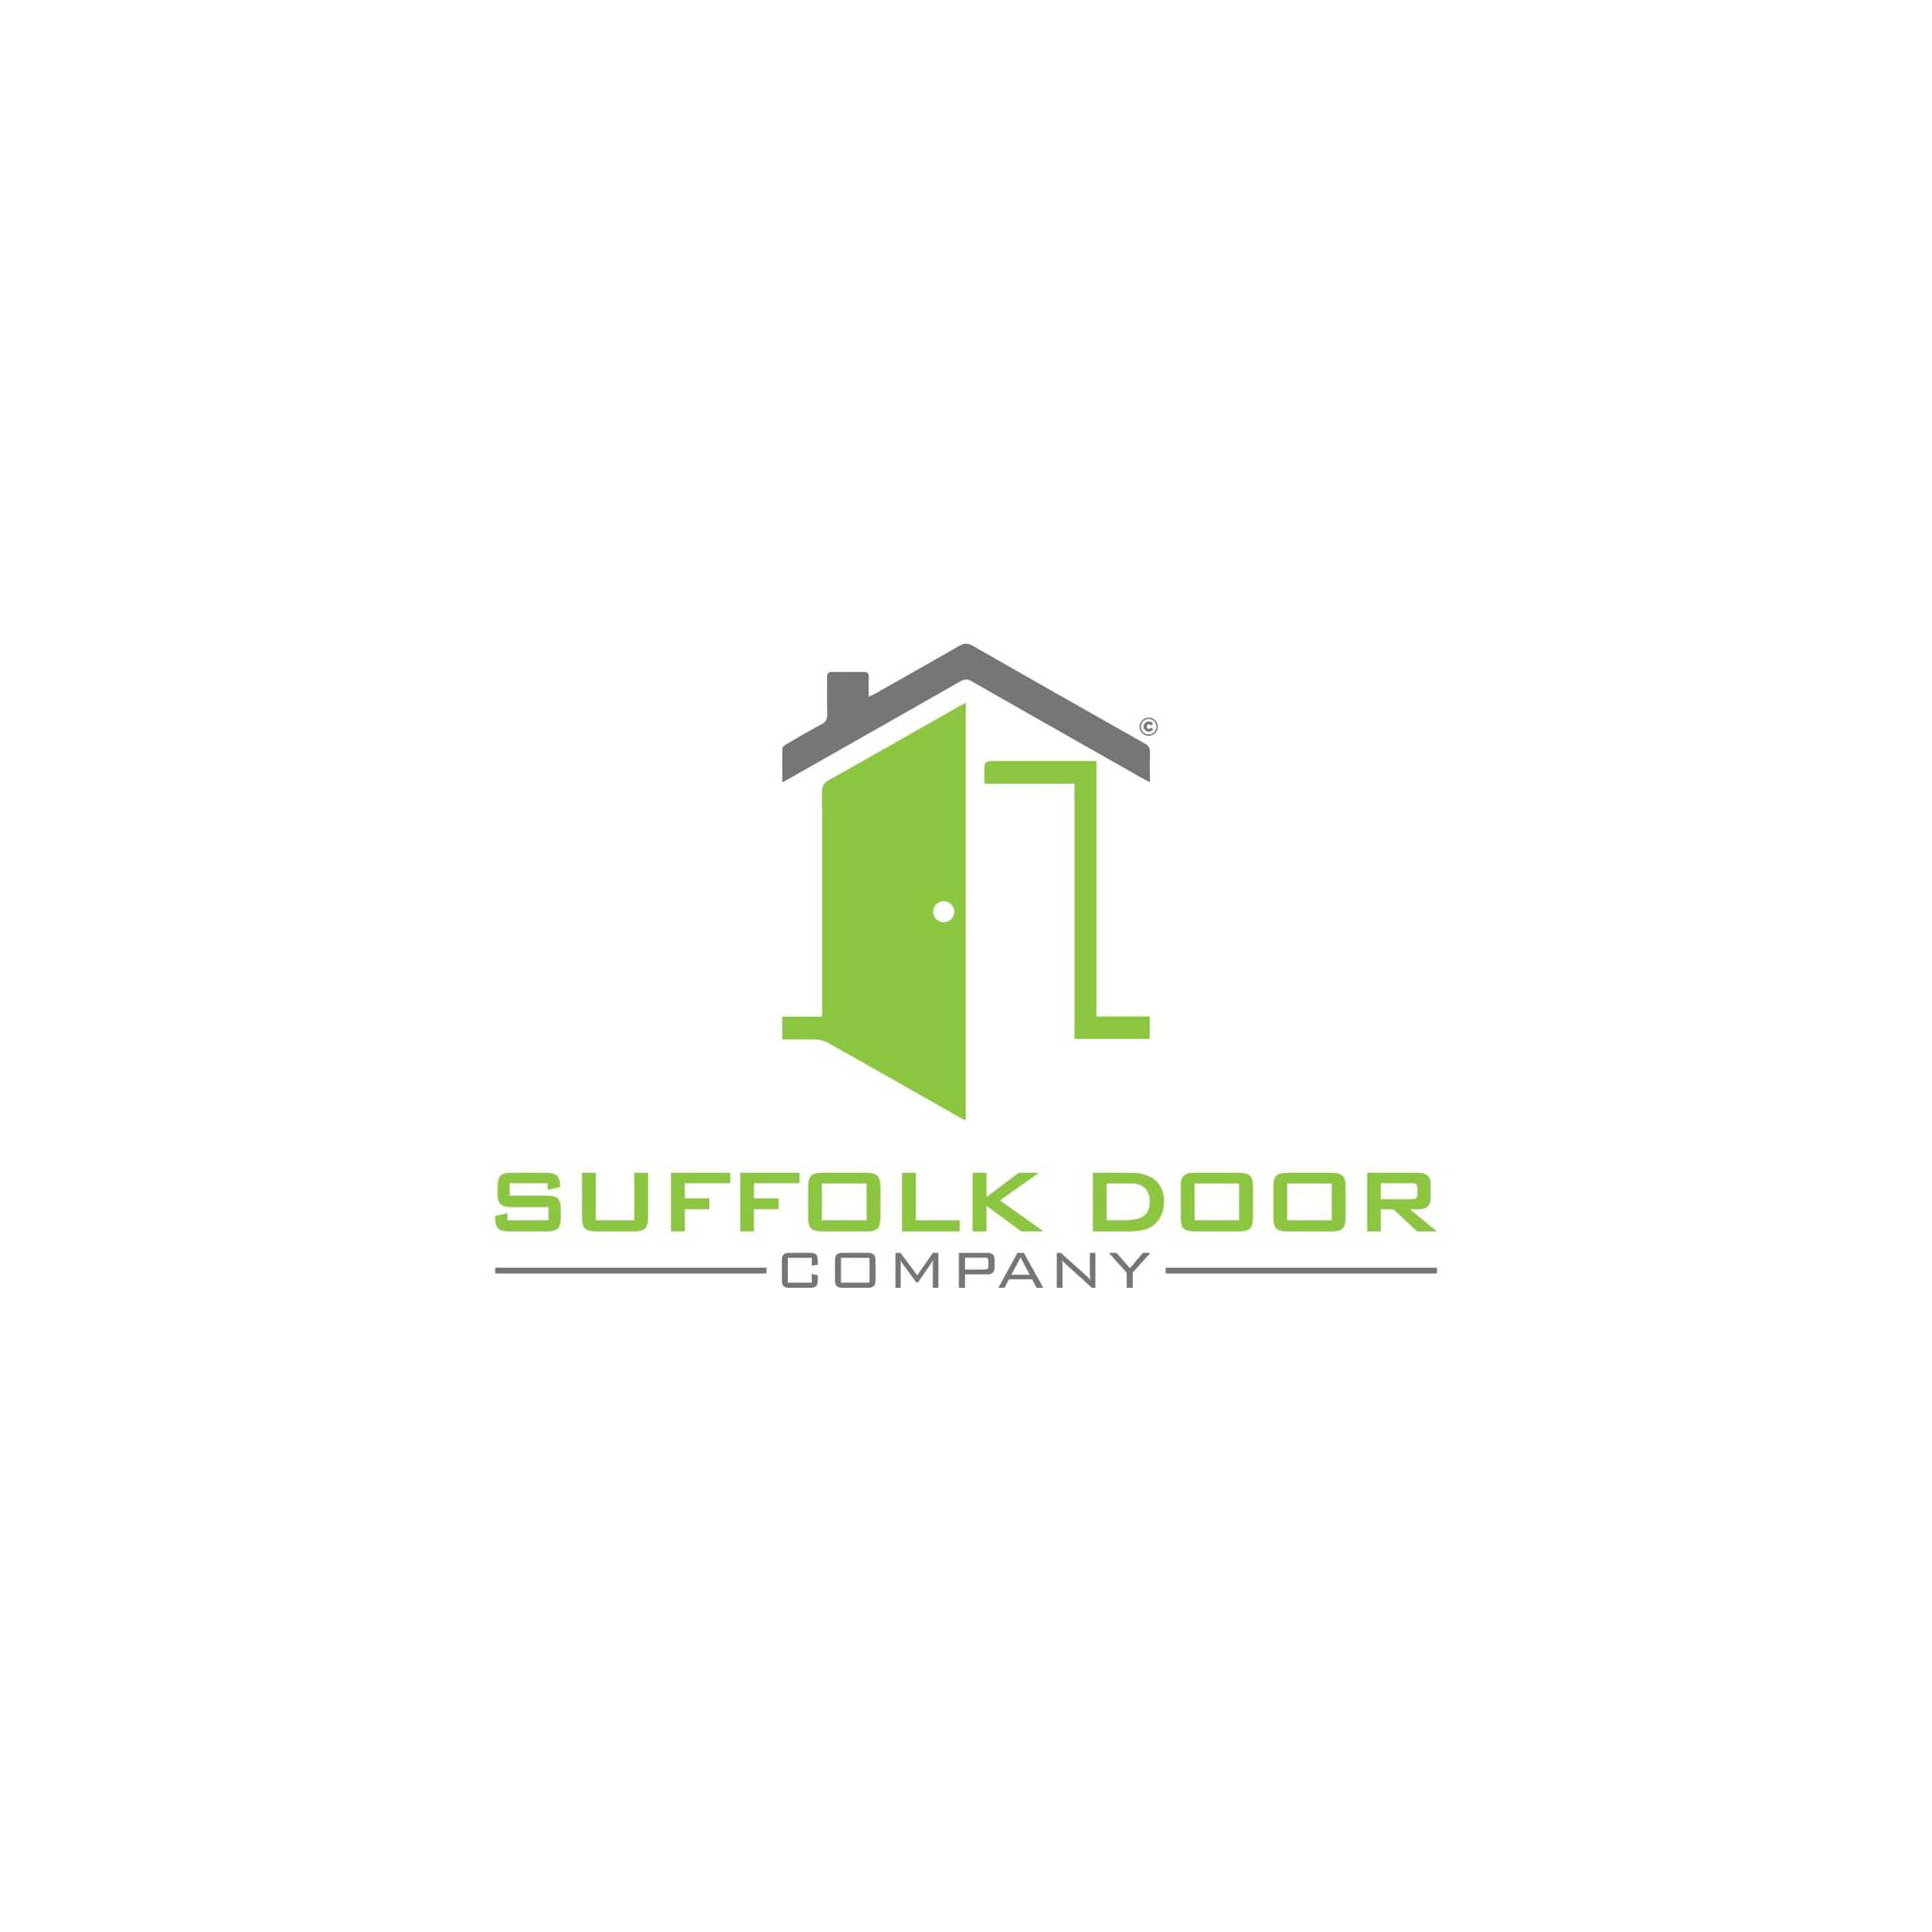 Suffolk Door Co - Ipswich, Essex IP3 9UE - 08001 956068 | ShowMeLocal.com